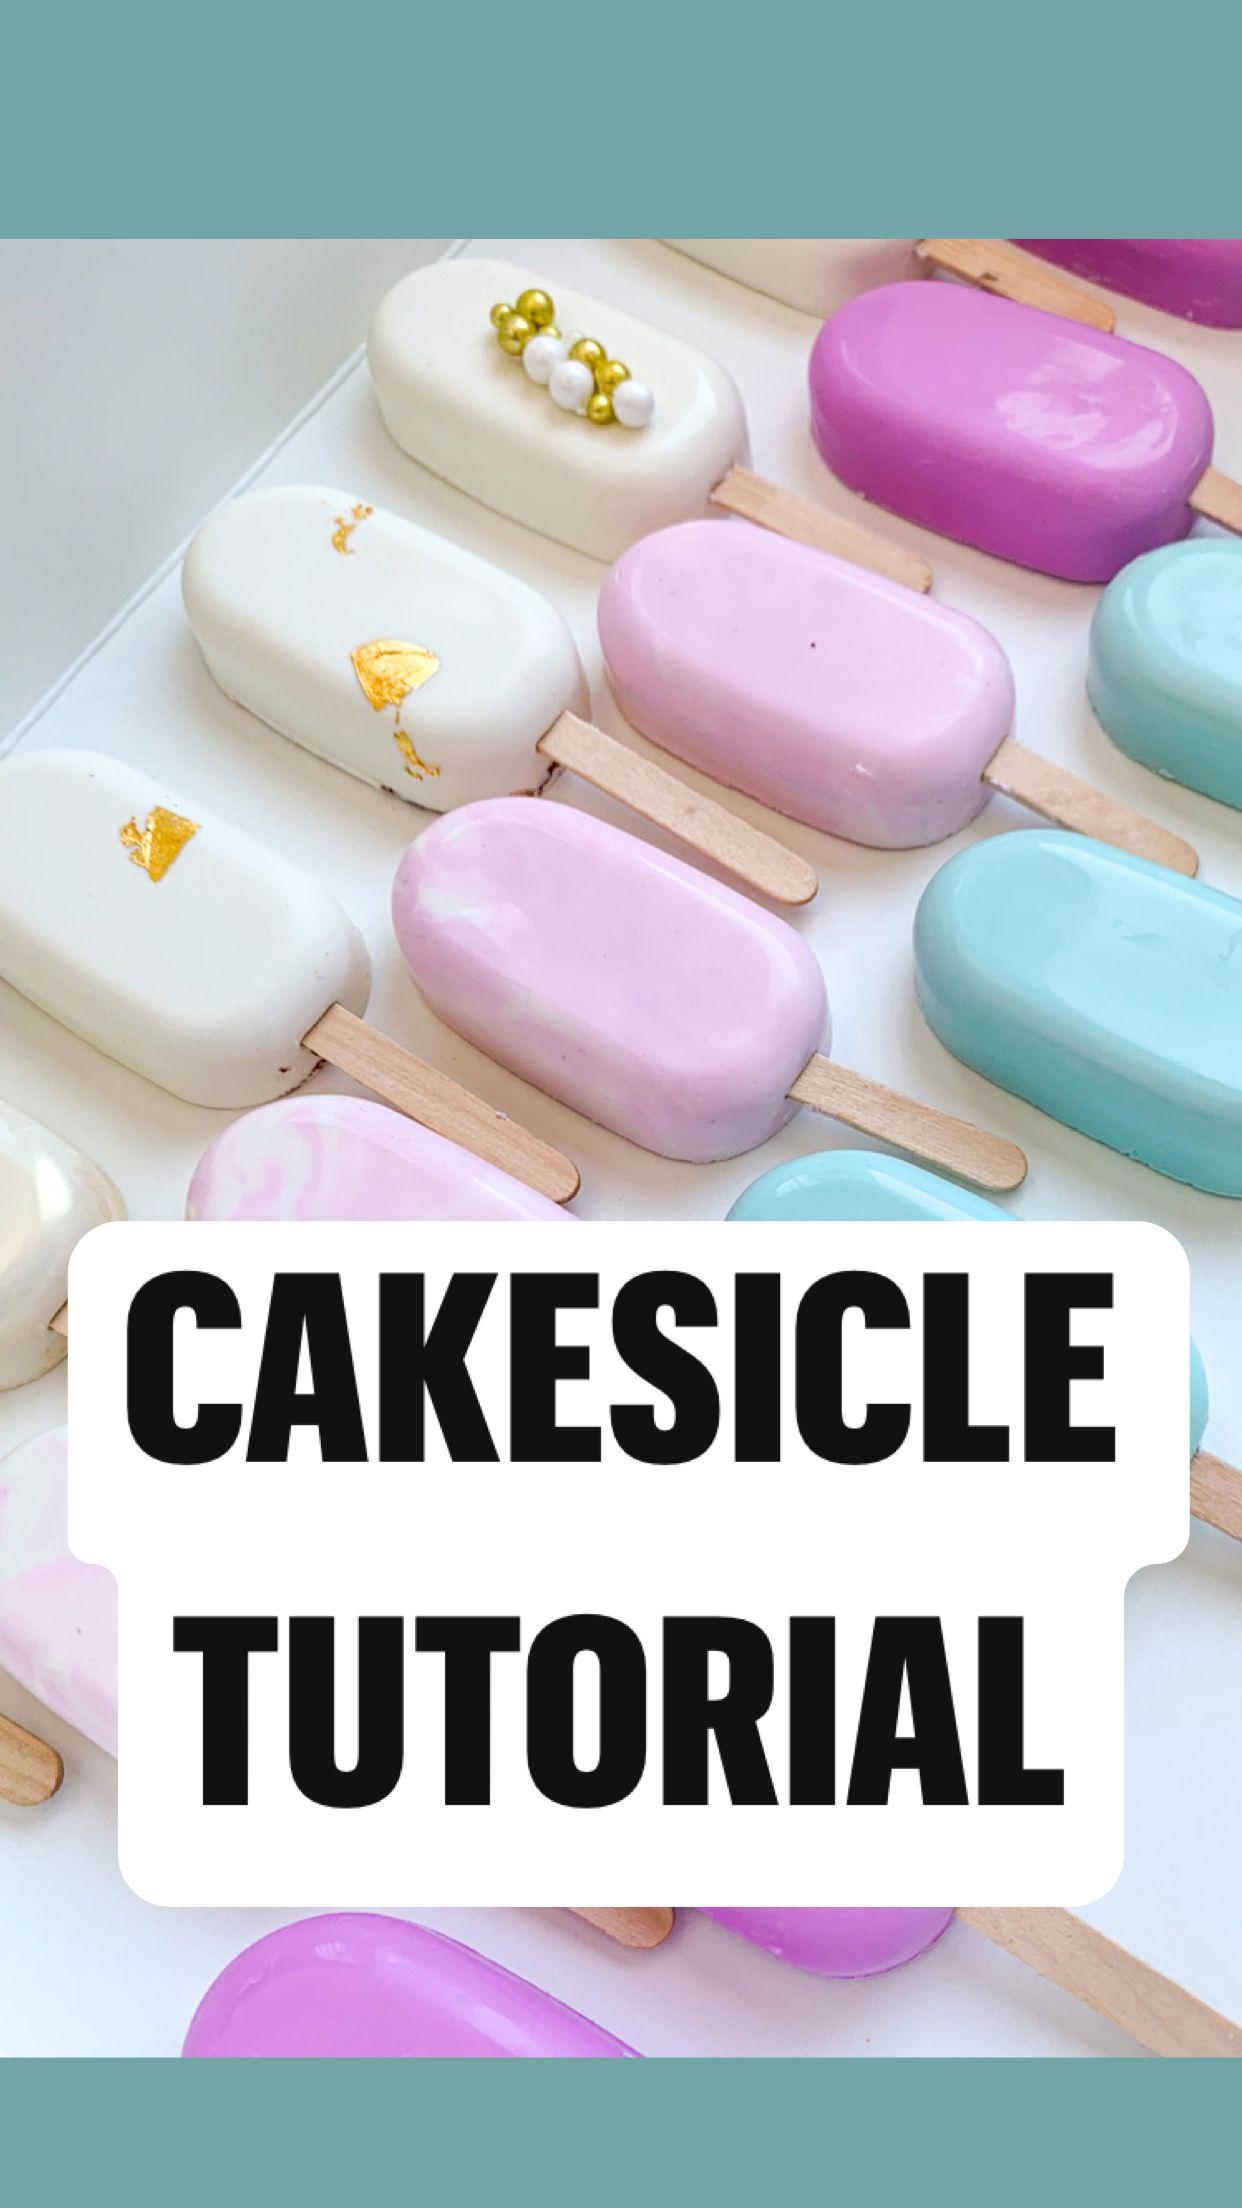 Cakesicle tutorial